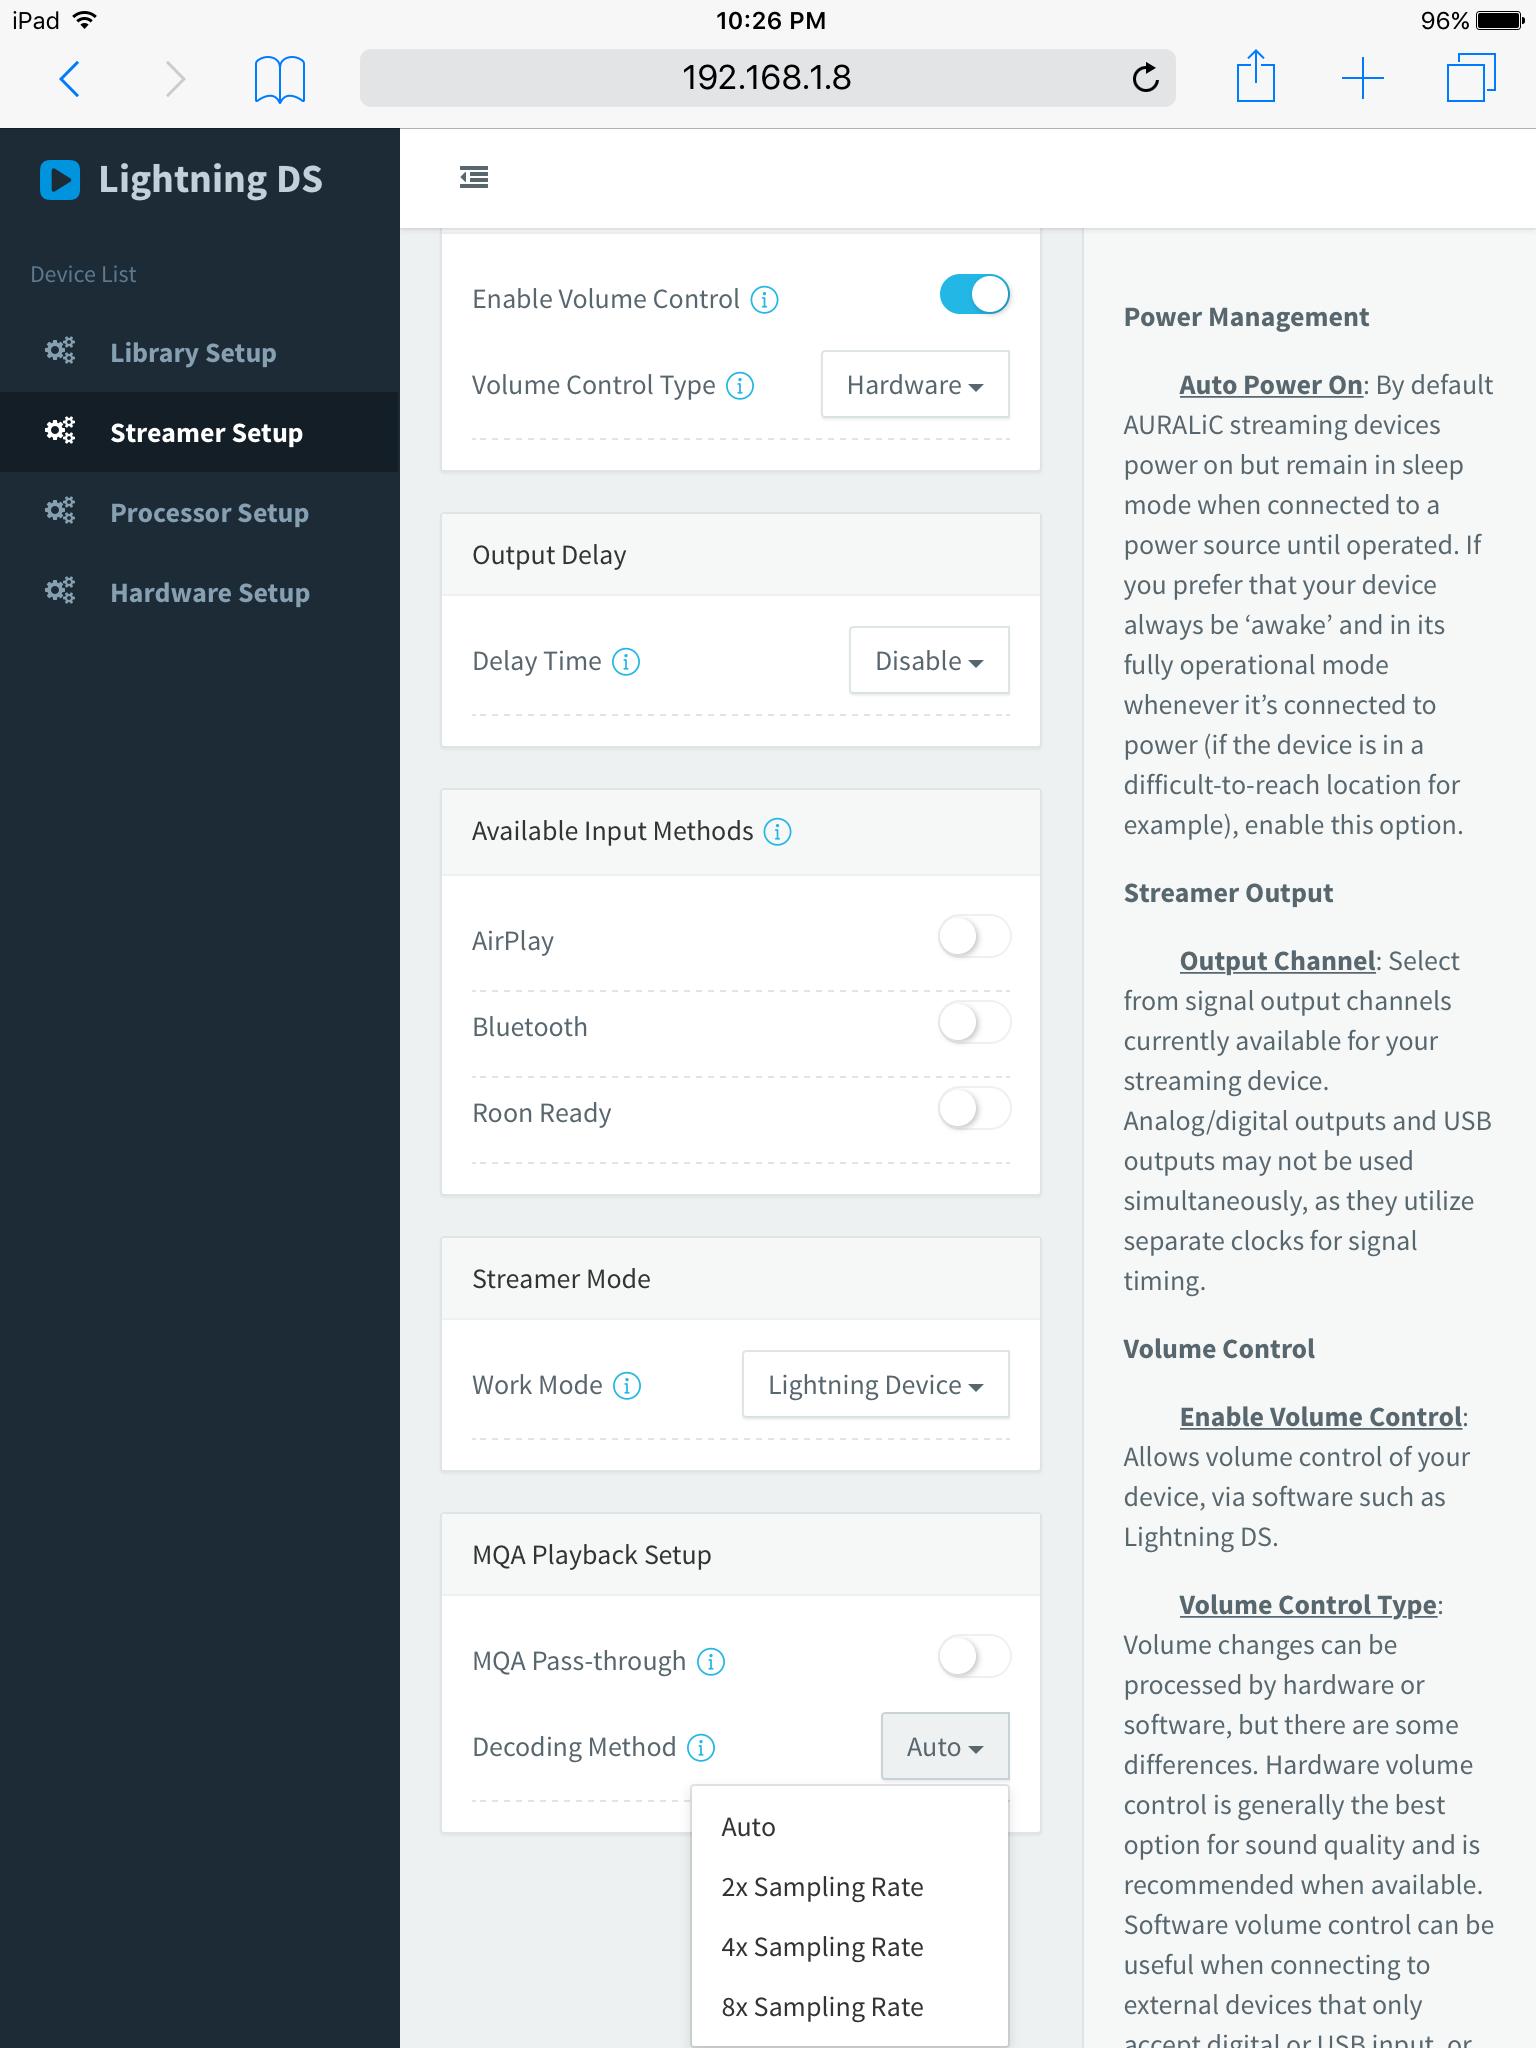 Auralic new beta firmware 5. 0 support